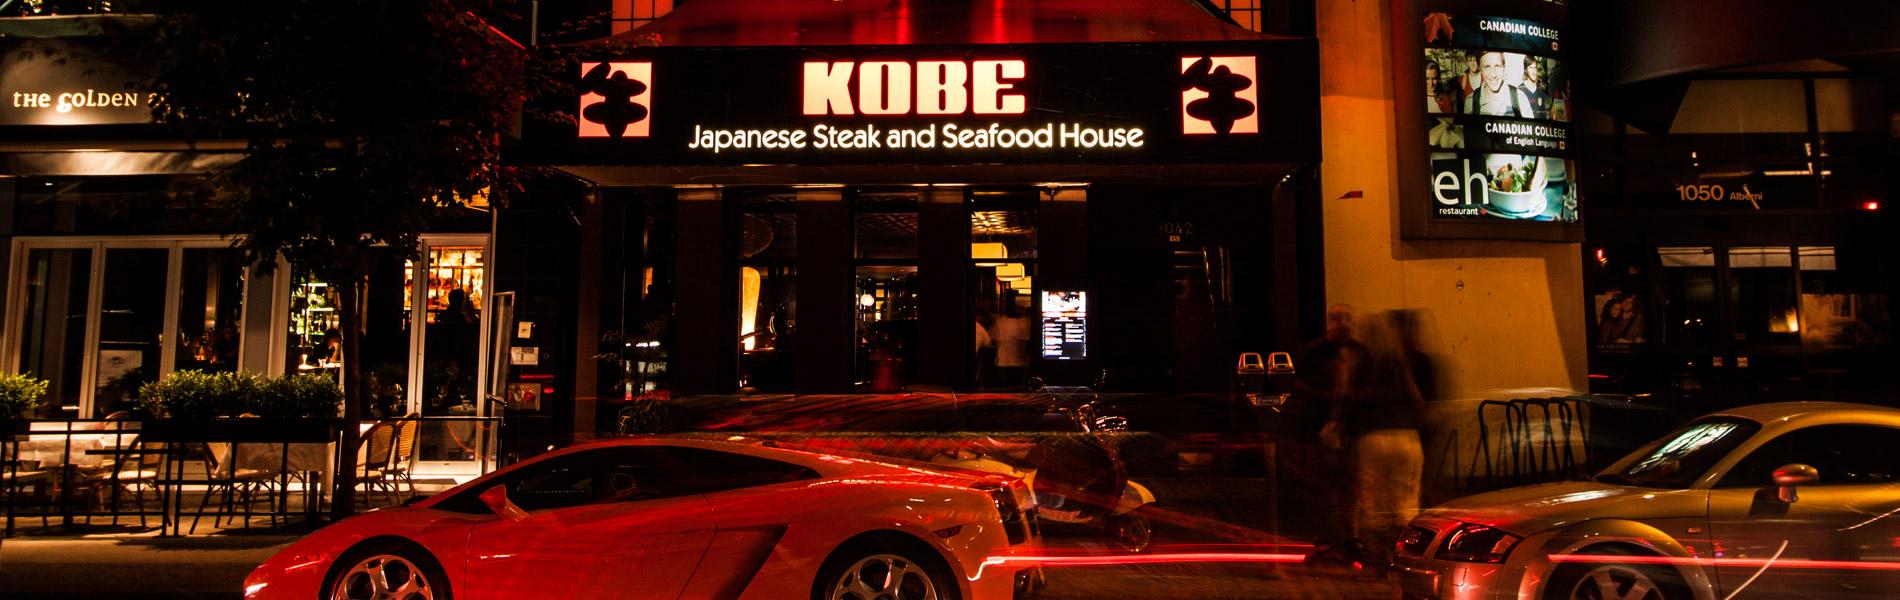 Kobe Steakhouse Vancouver